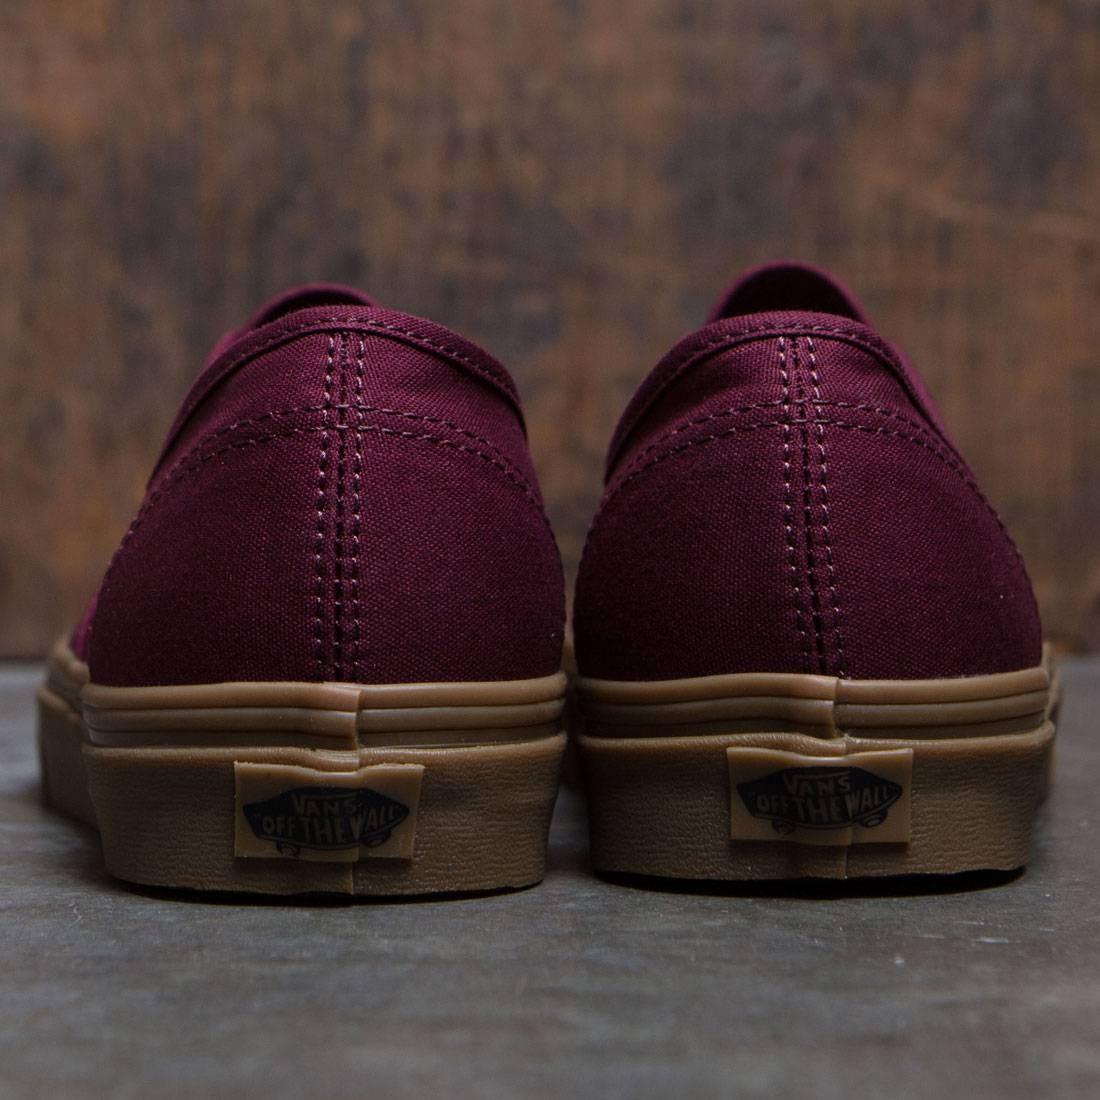 Vans Men Authentic - Light Gum burgundy